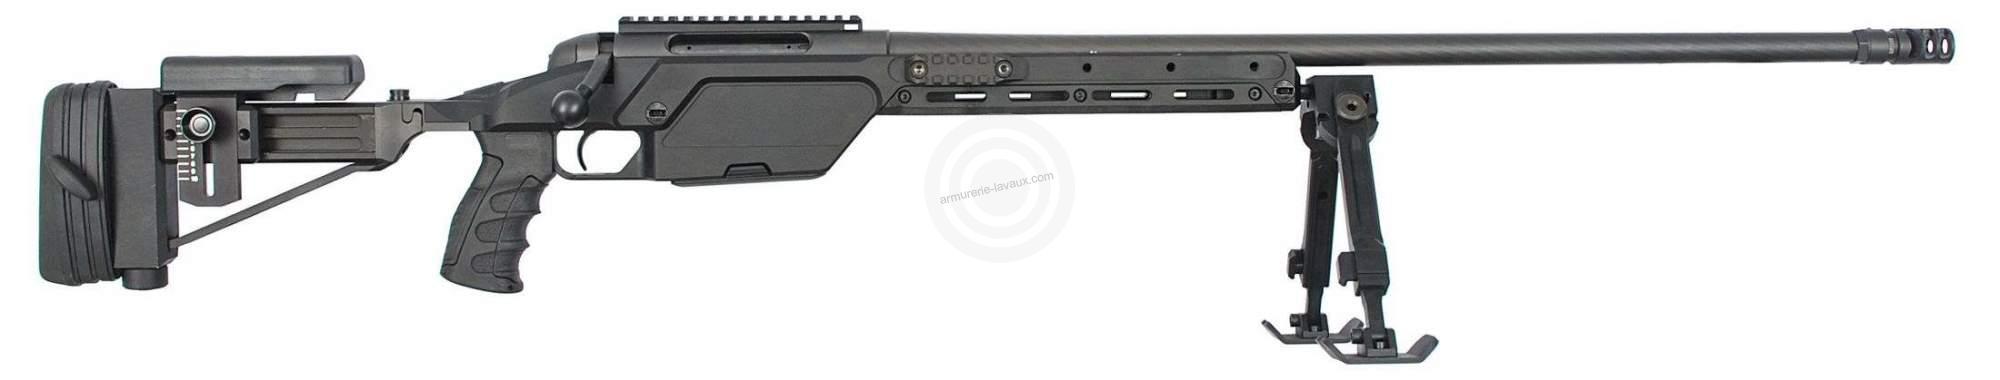 steyr mannlicher ssg08 carabines de tir sur armurerie lavaux. Black Bedroom Furniture Sets. Home Design Ideas